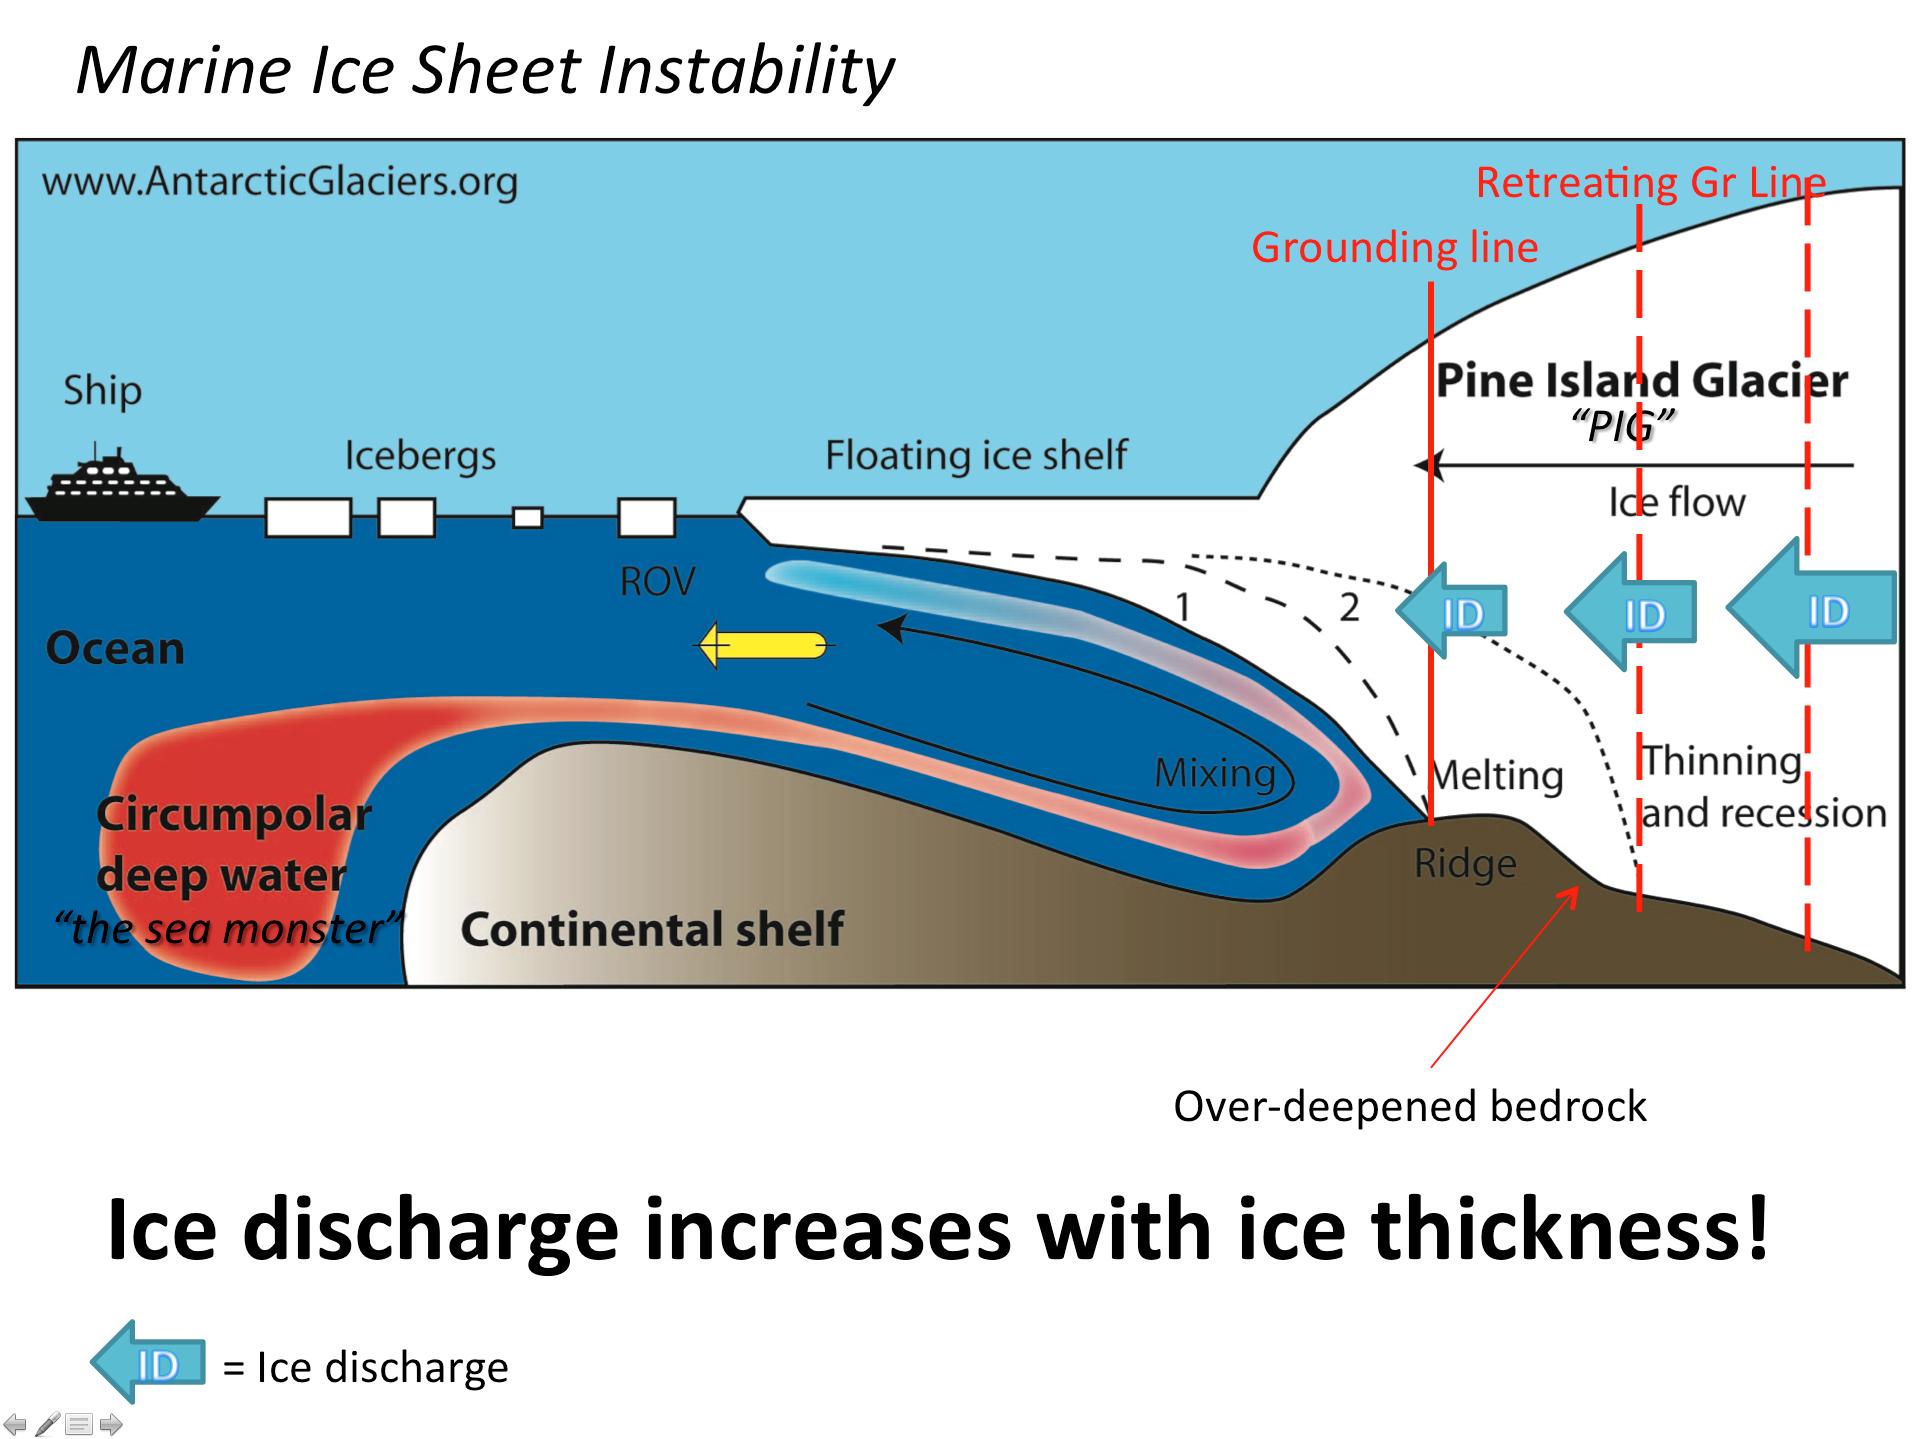 Image from AntarcticGlaciers.org based on Schoof, 2010.